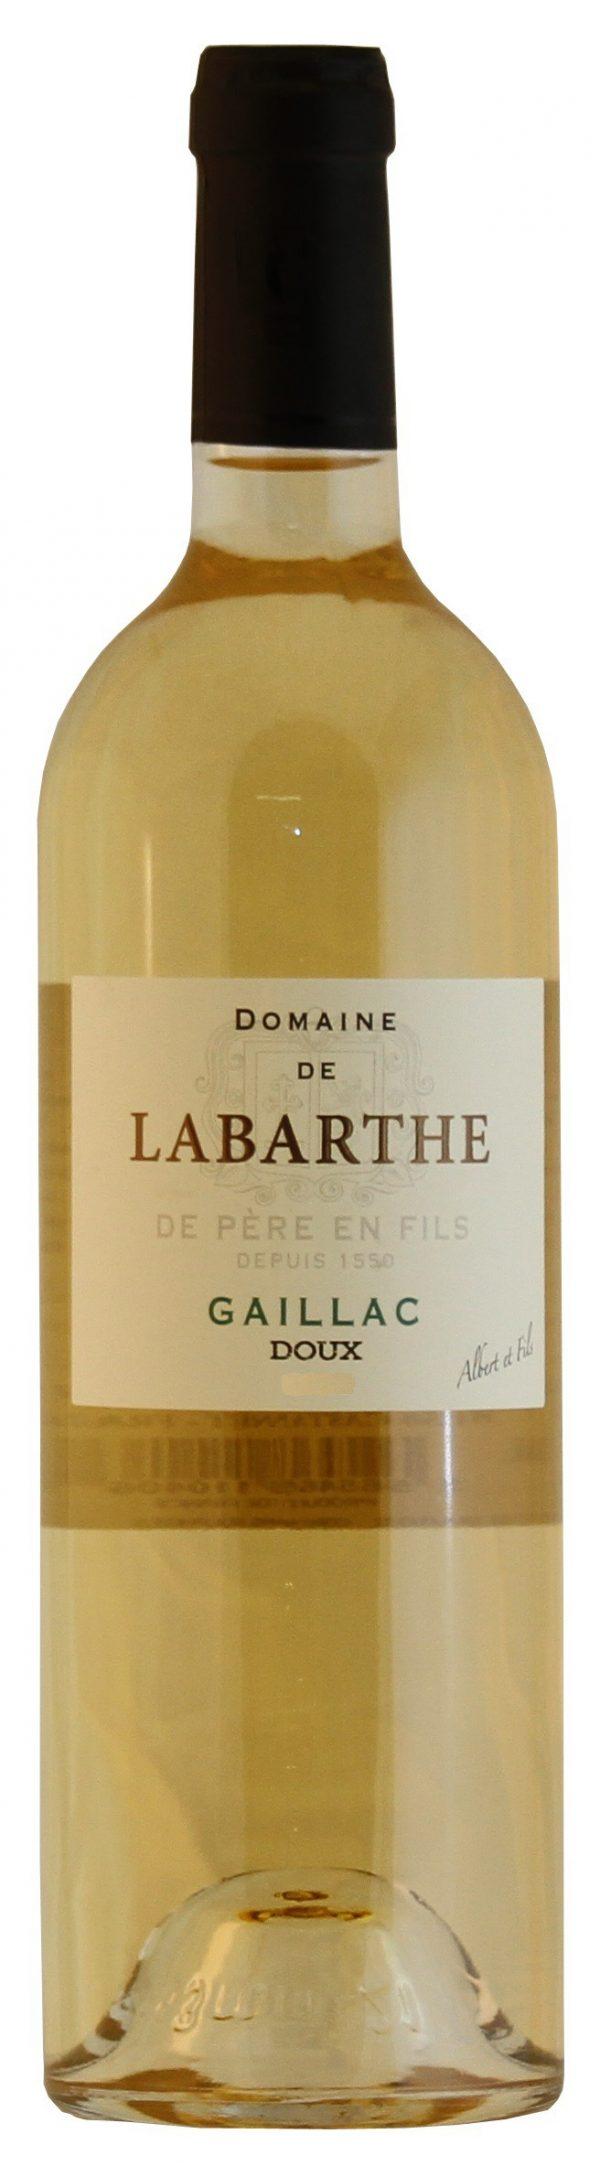 Domaine de Labarthe - Tradition Doux - Gaillac